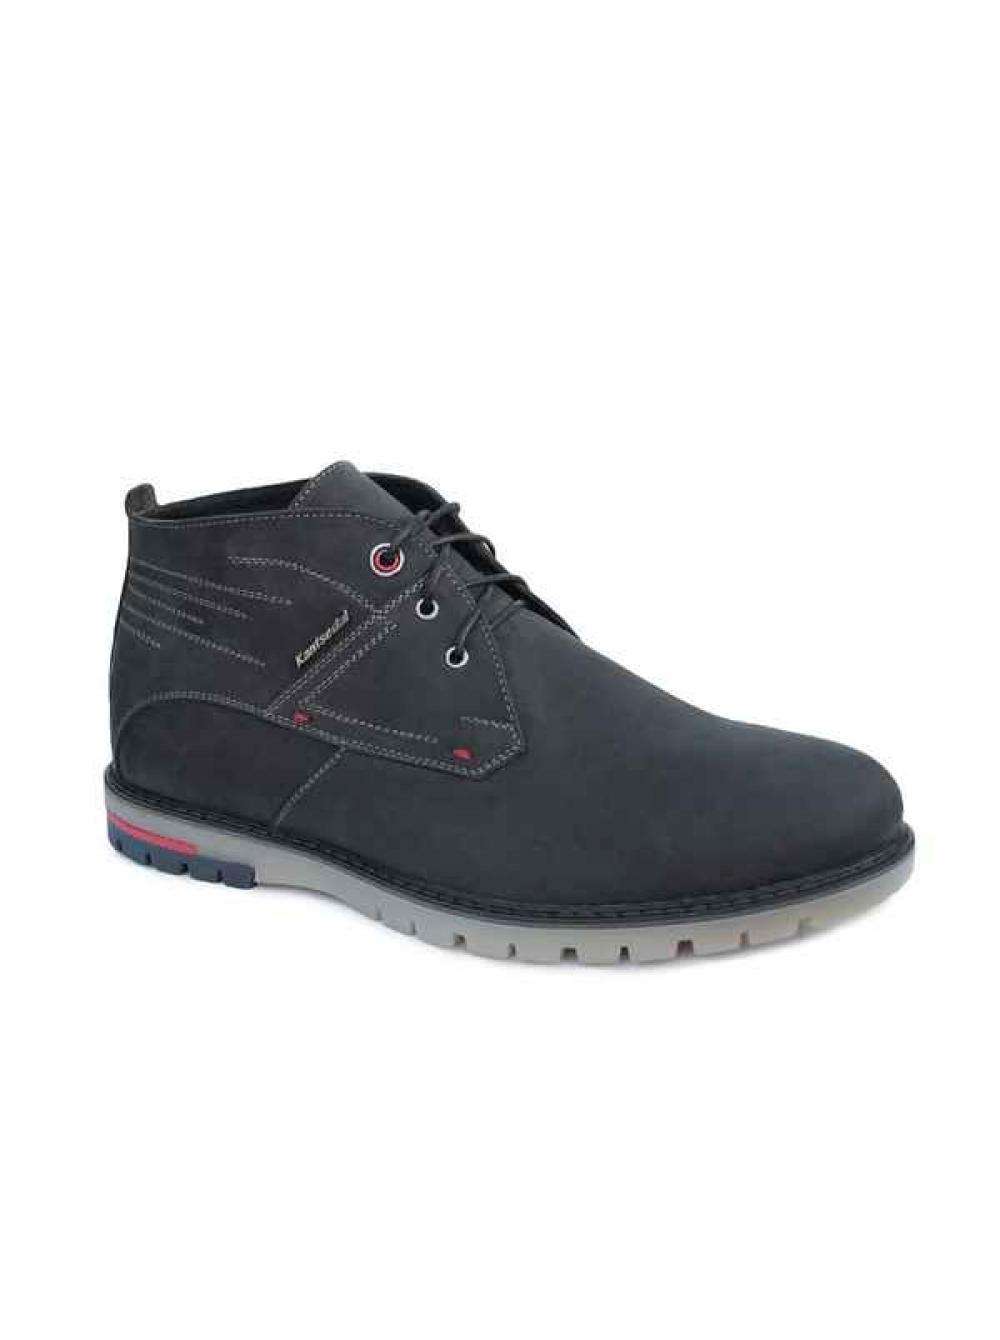 Cheap 234019 Air Jordan 5 (V) Men Raging Bull Red Red Black Shoes